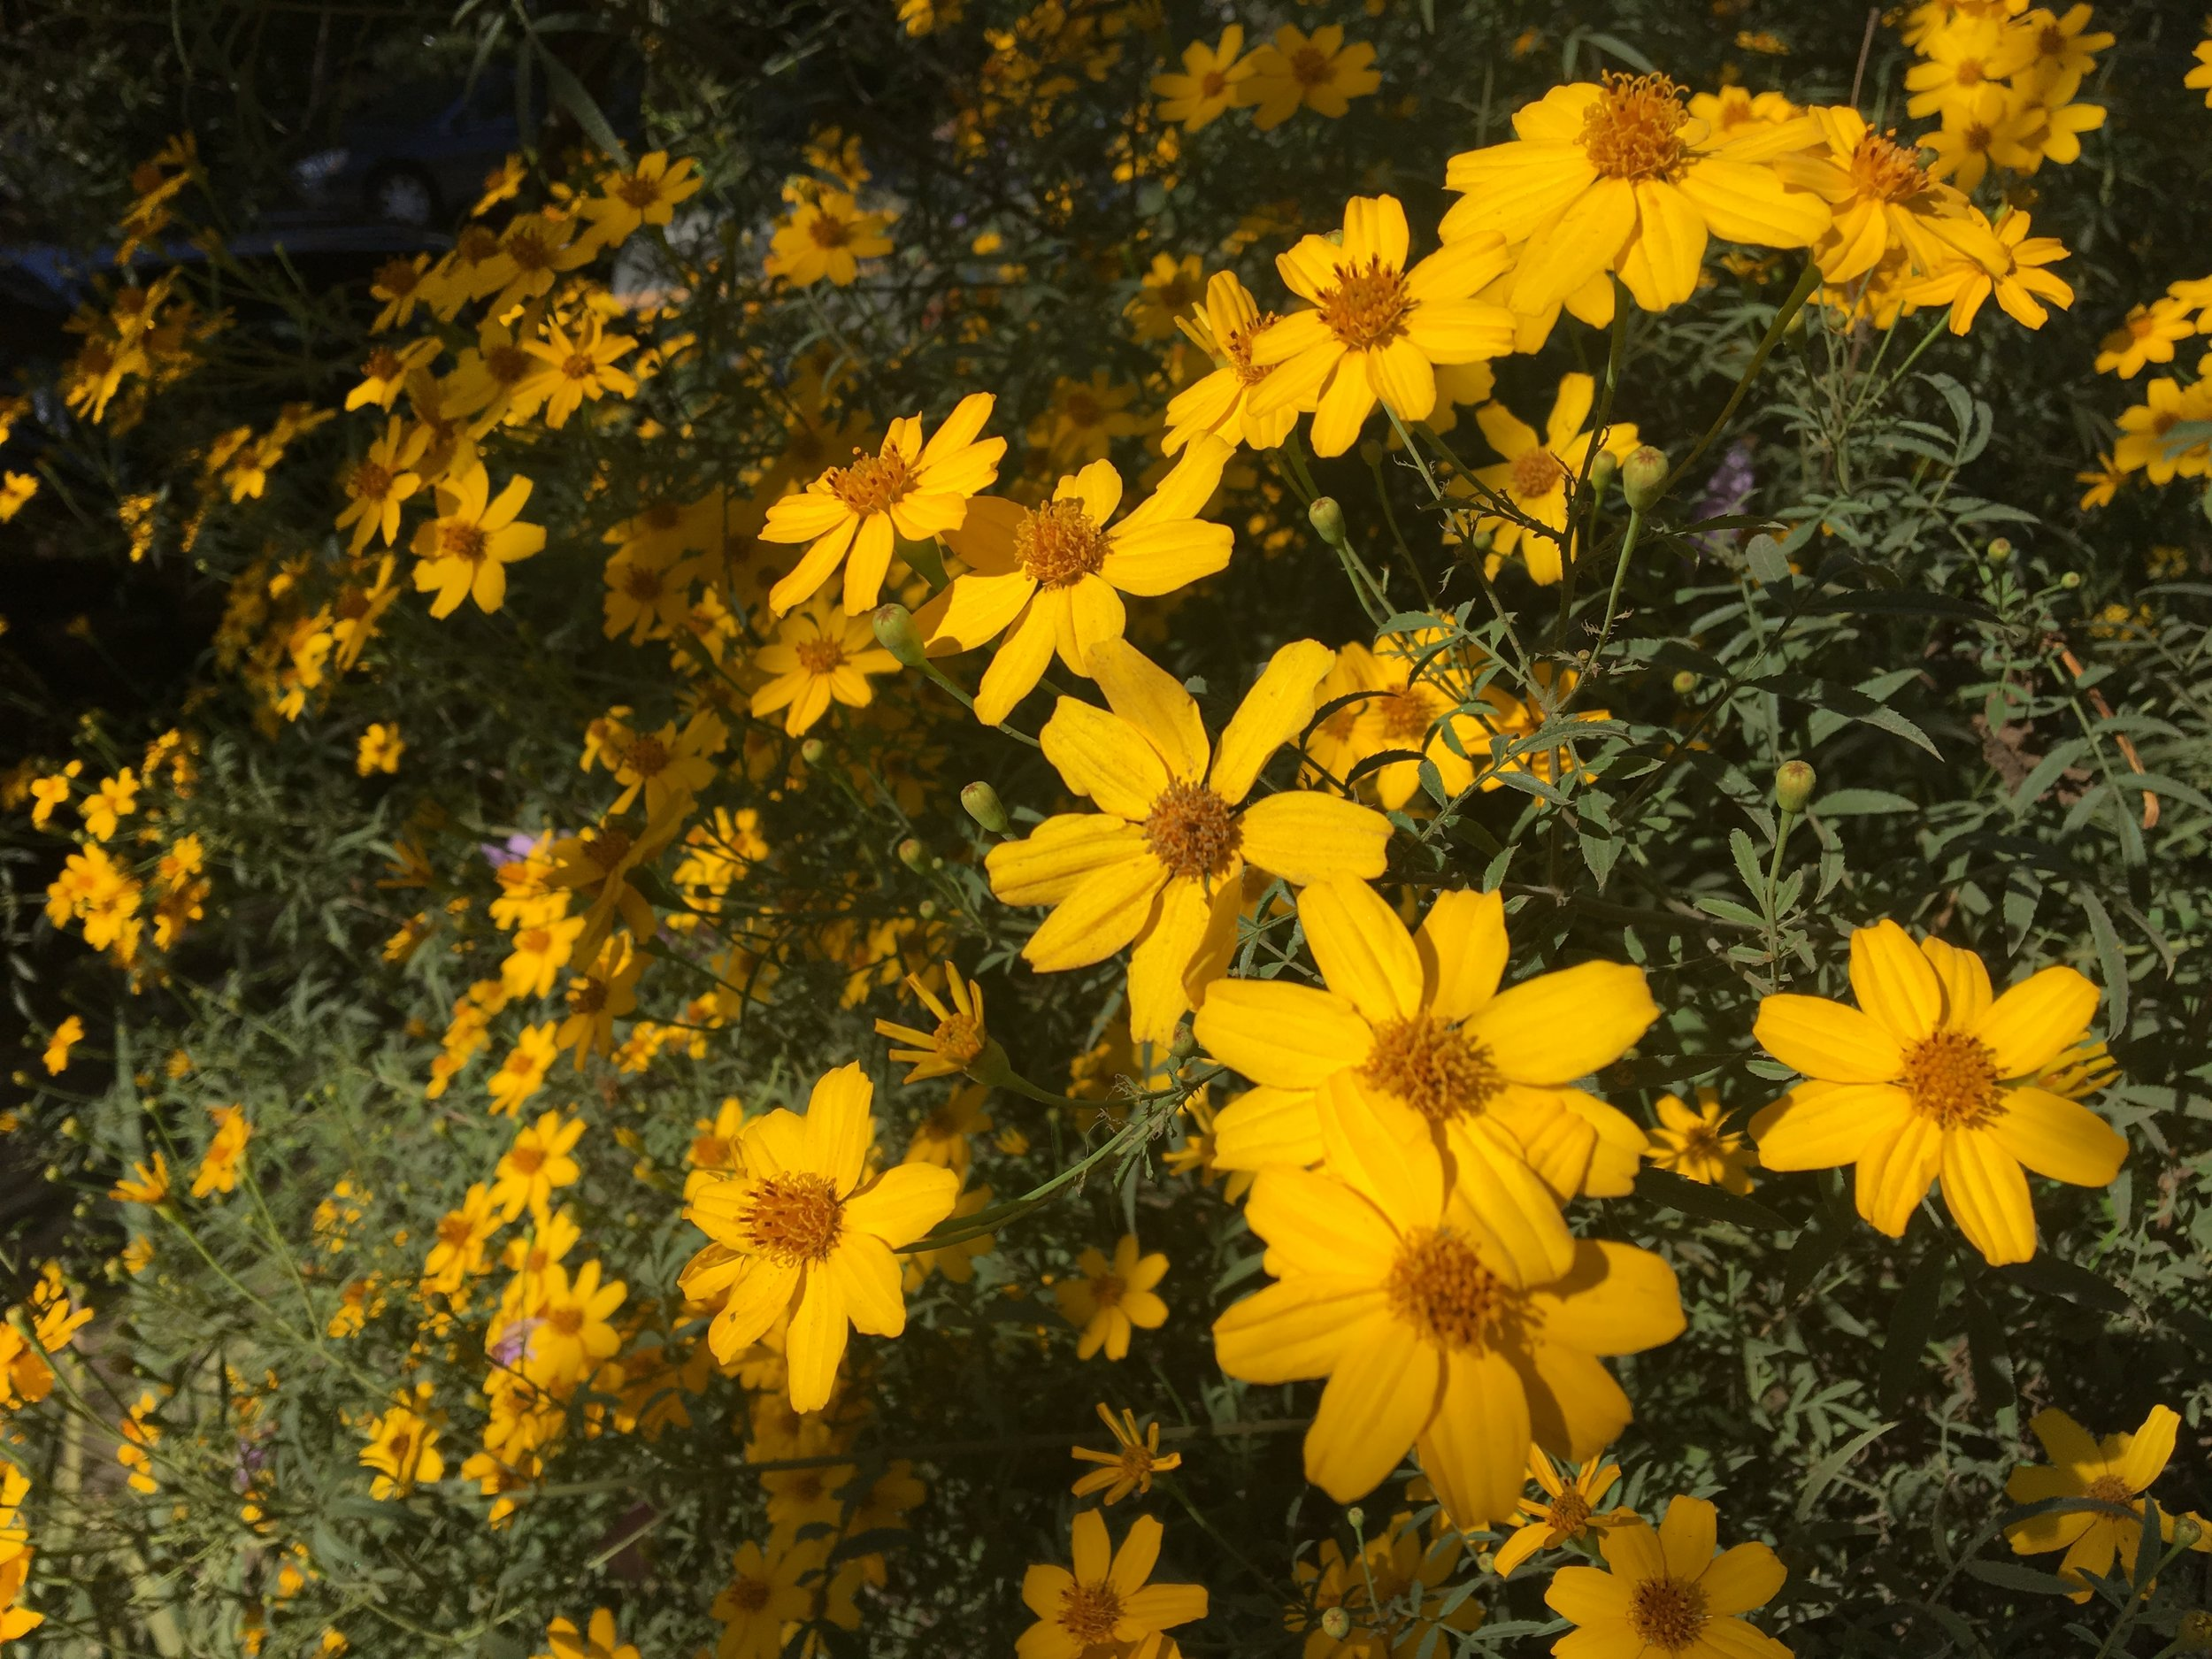 Copper Canyon daisy ( Tagetes lemmonii ) at GFE.